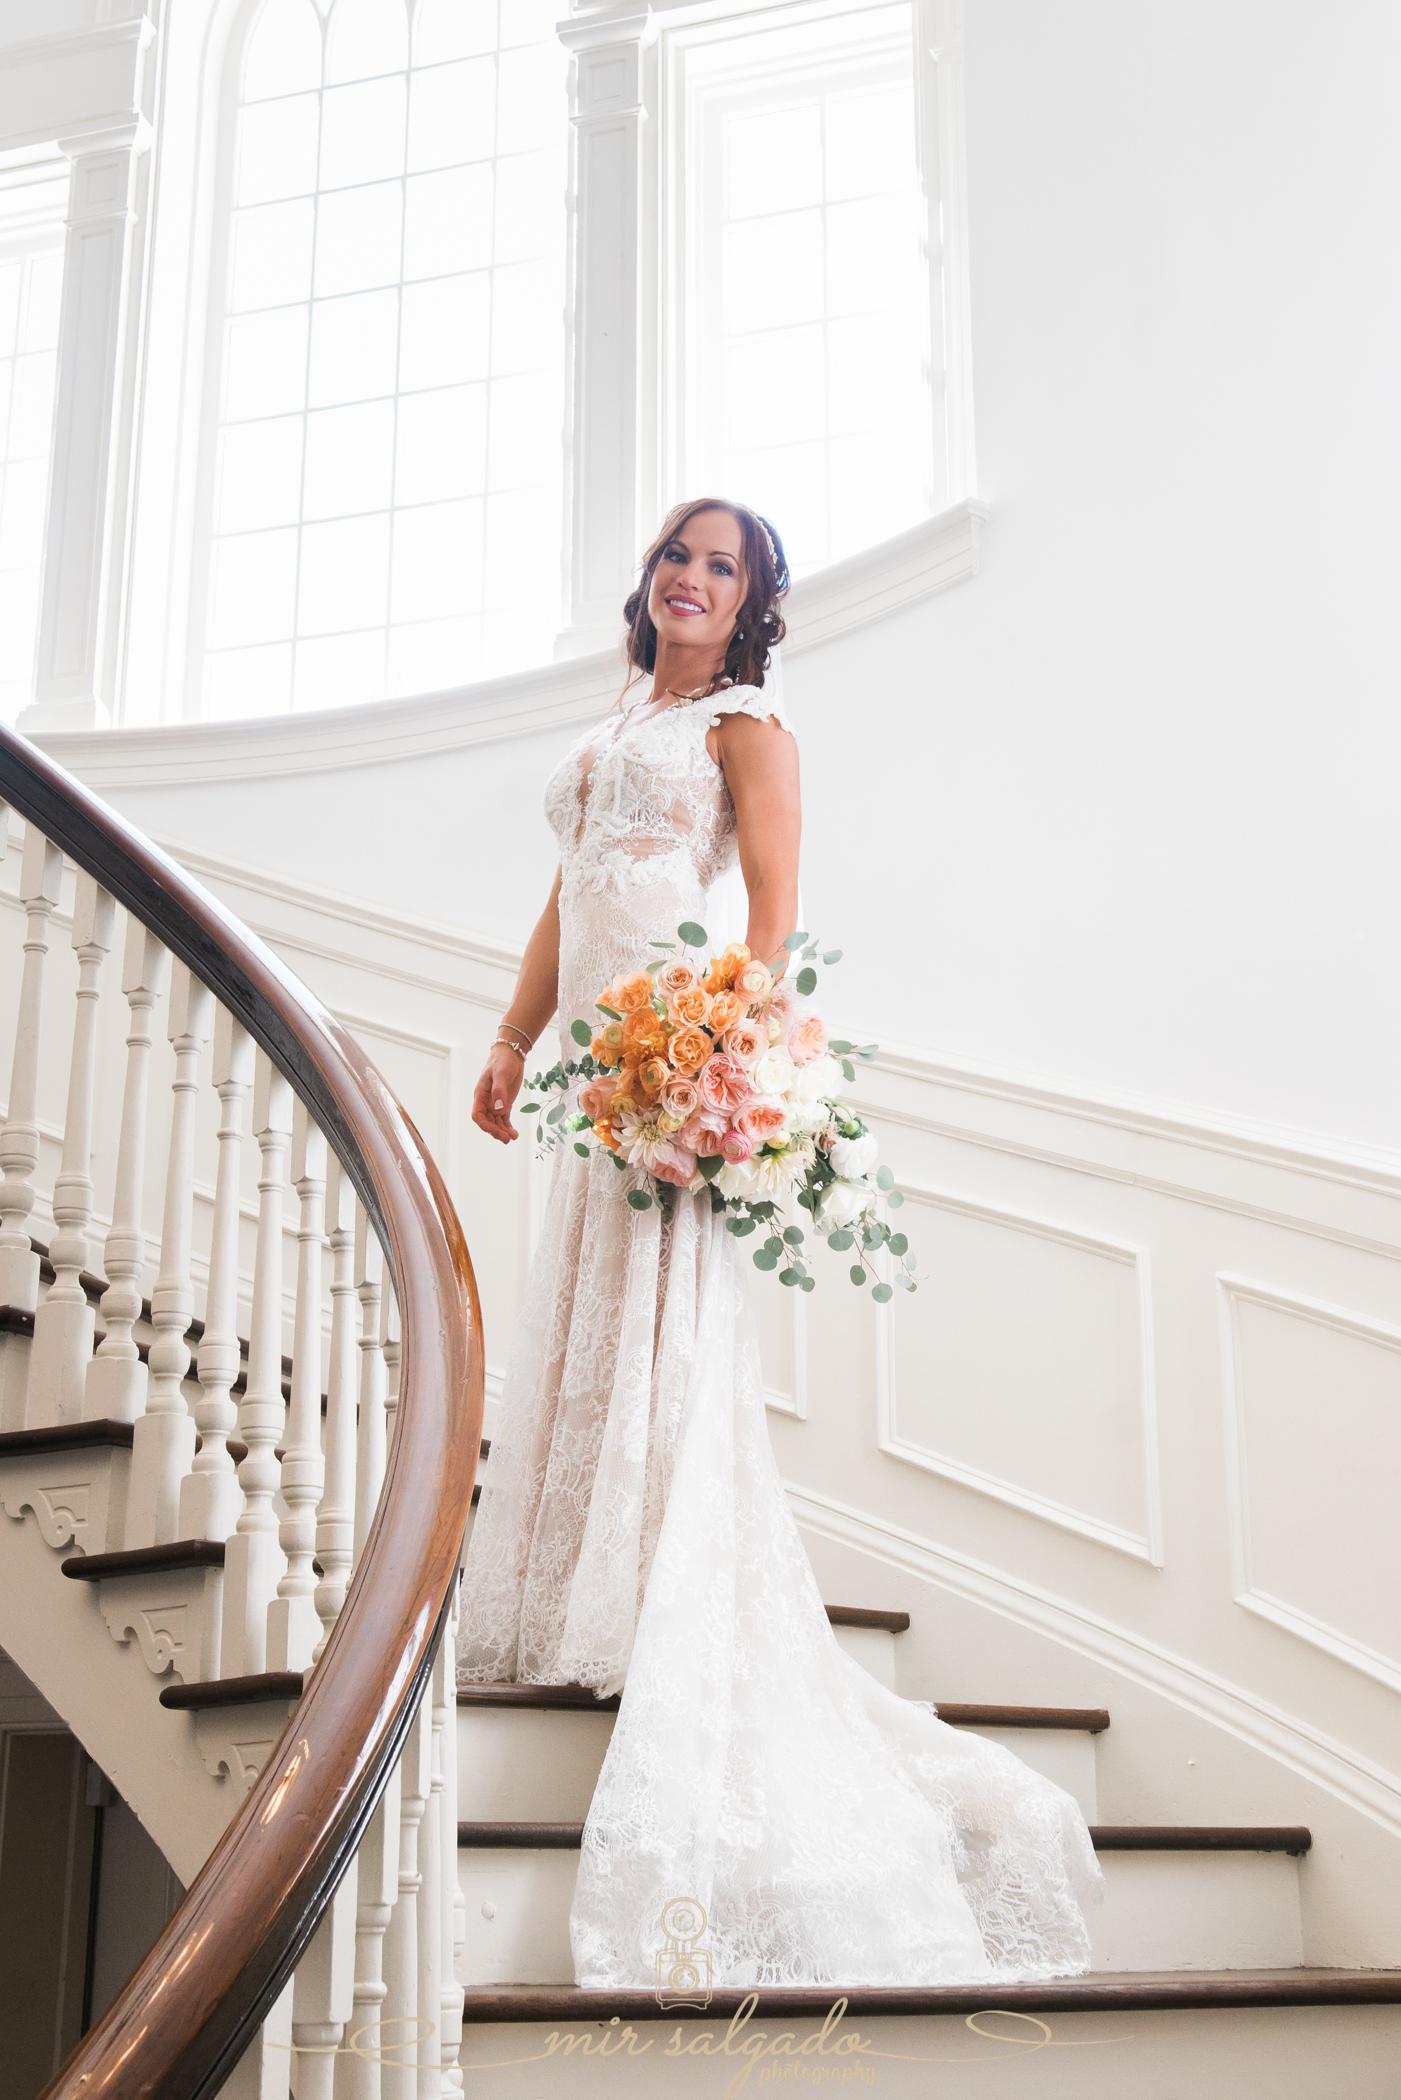 Tampa-bride-photo, Tampa-yacht-club-wedding-photo